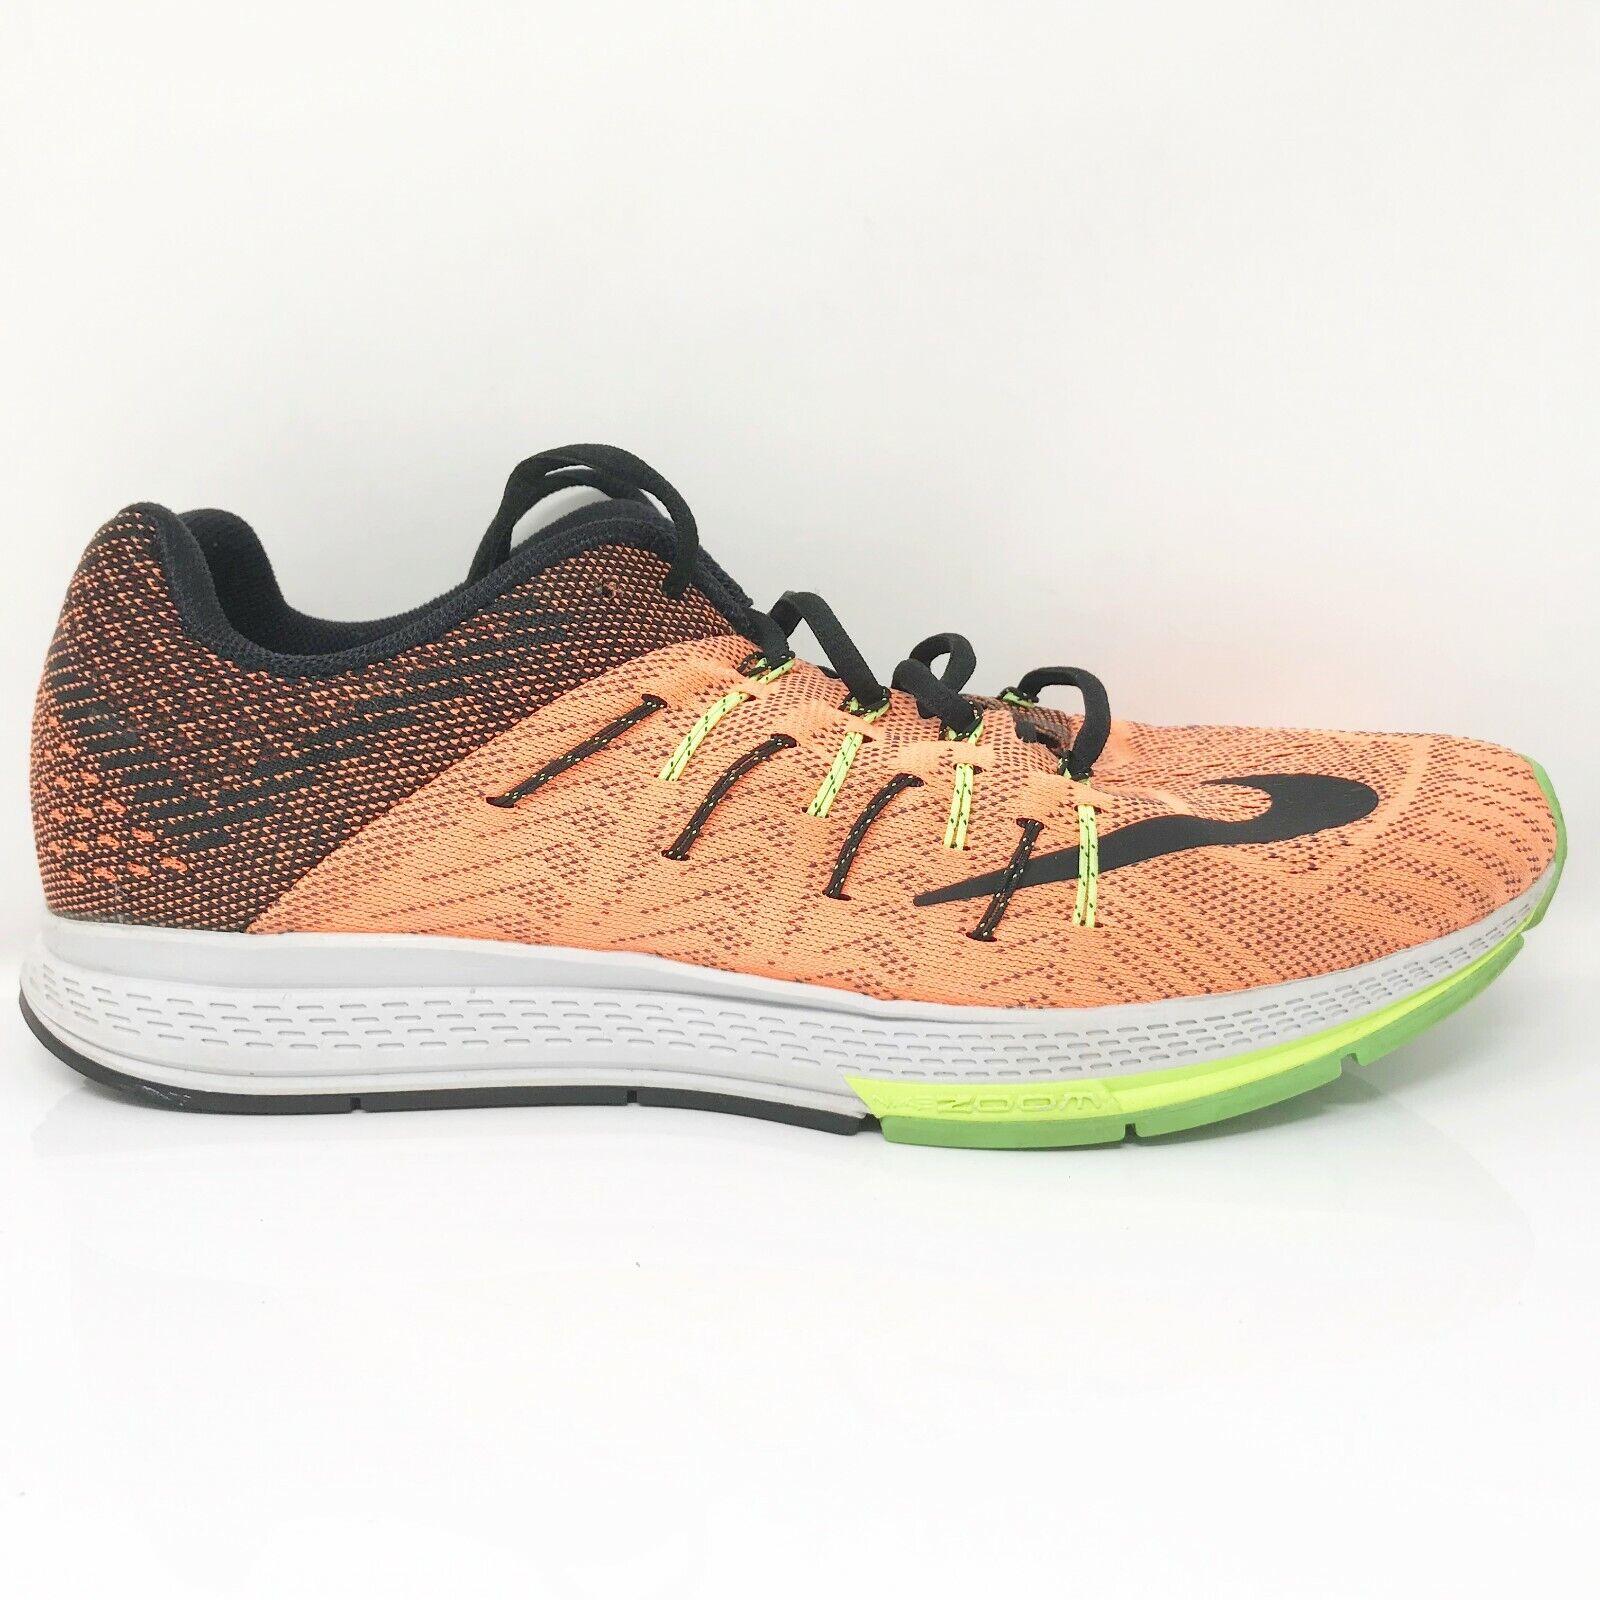 Size 11.5 - Nike Air Zoom Elite 8 Orange for sale online   eBay